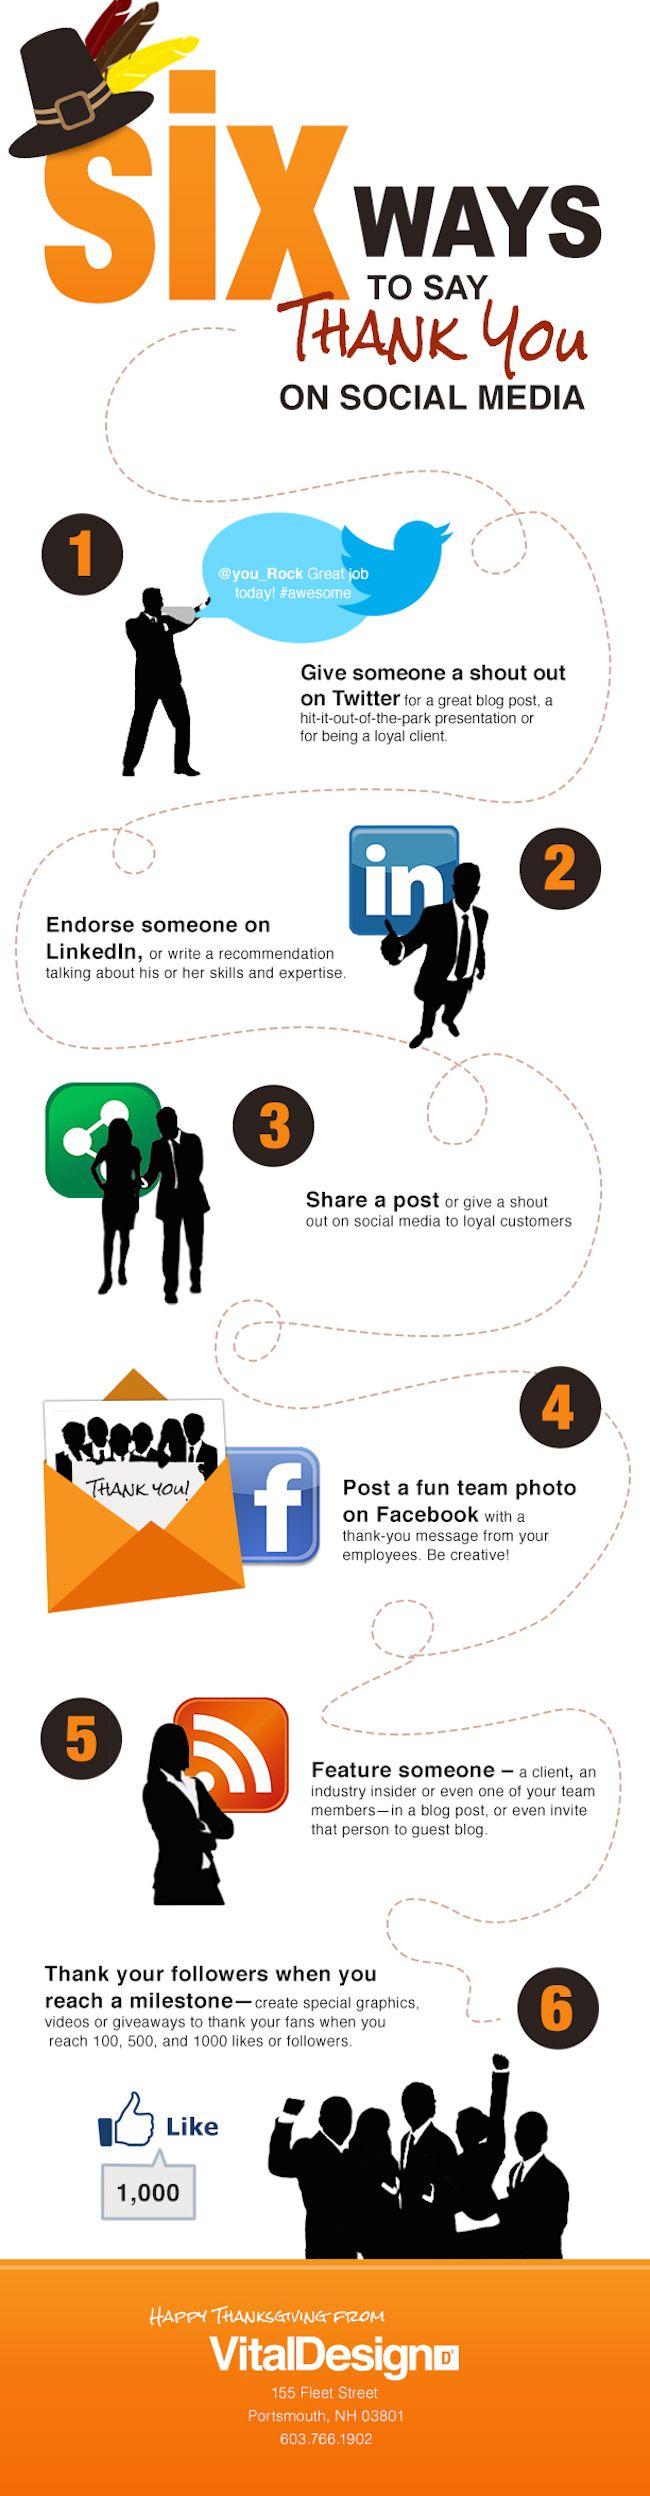 #Infographic || 6 Ways to Say 'Thank You' on #SocialMedia || #thankyou #sm #besocial